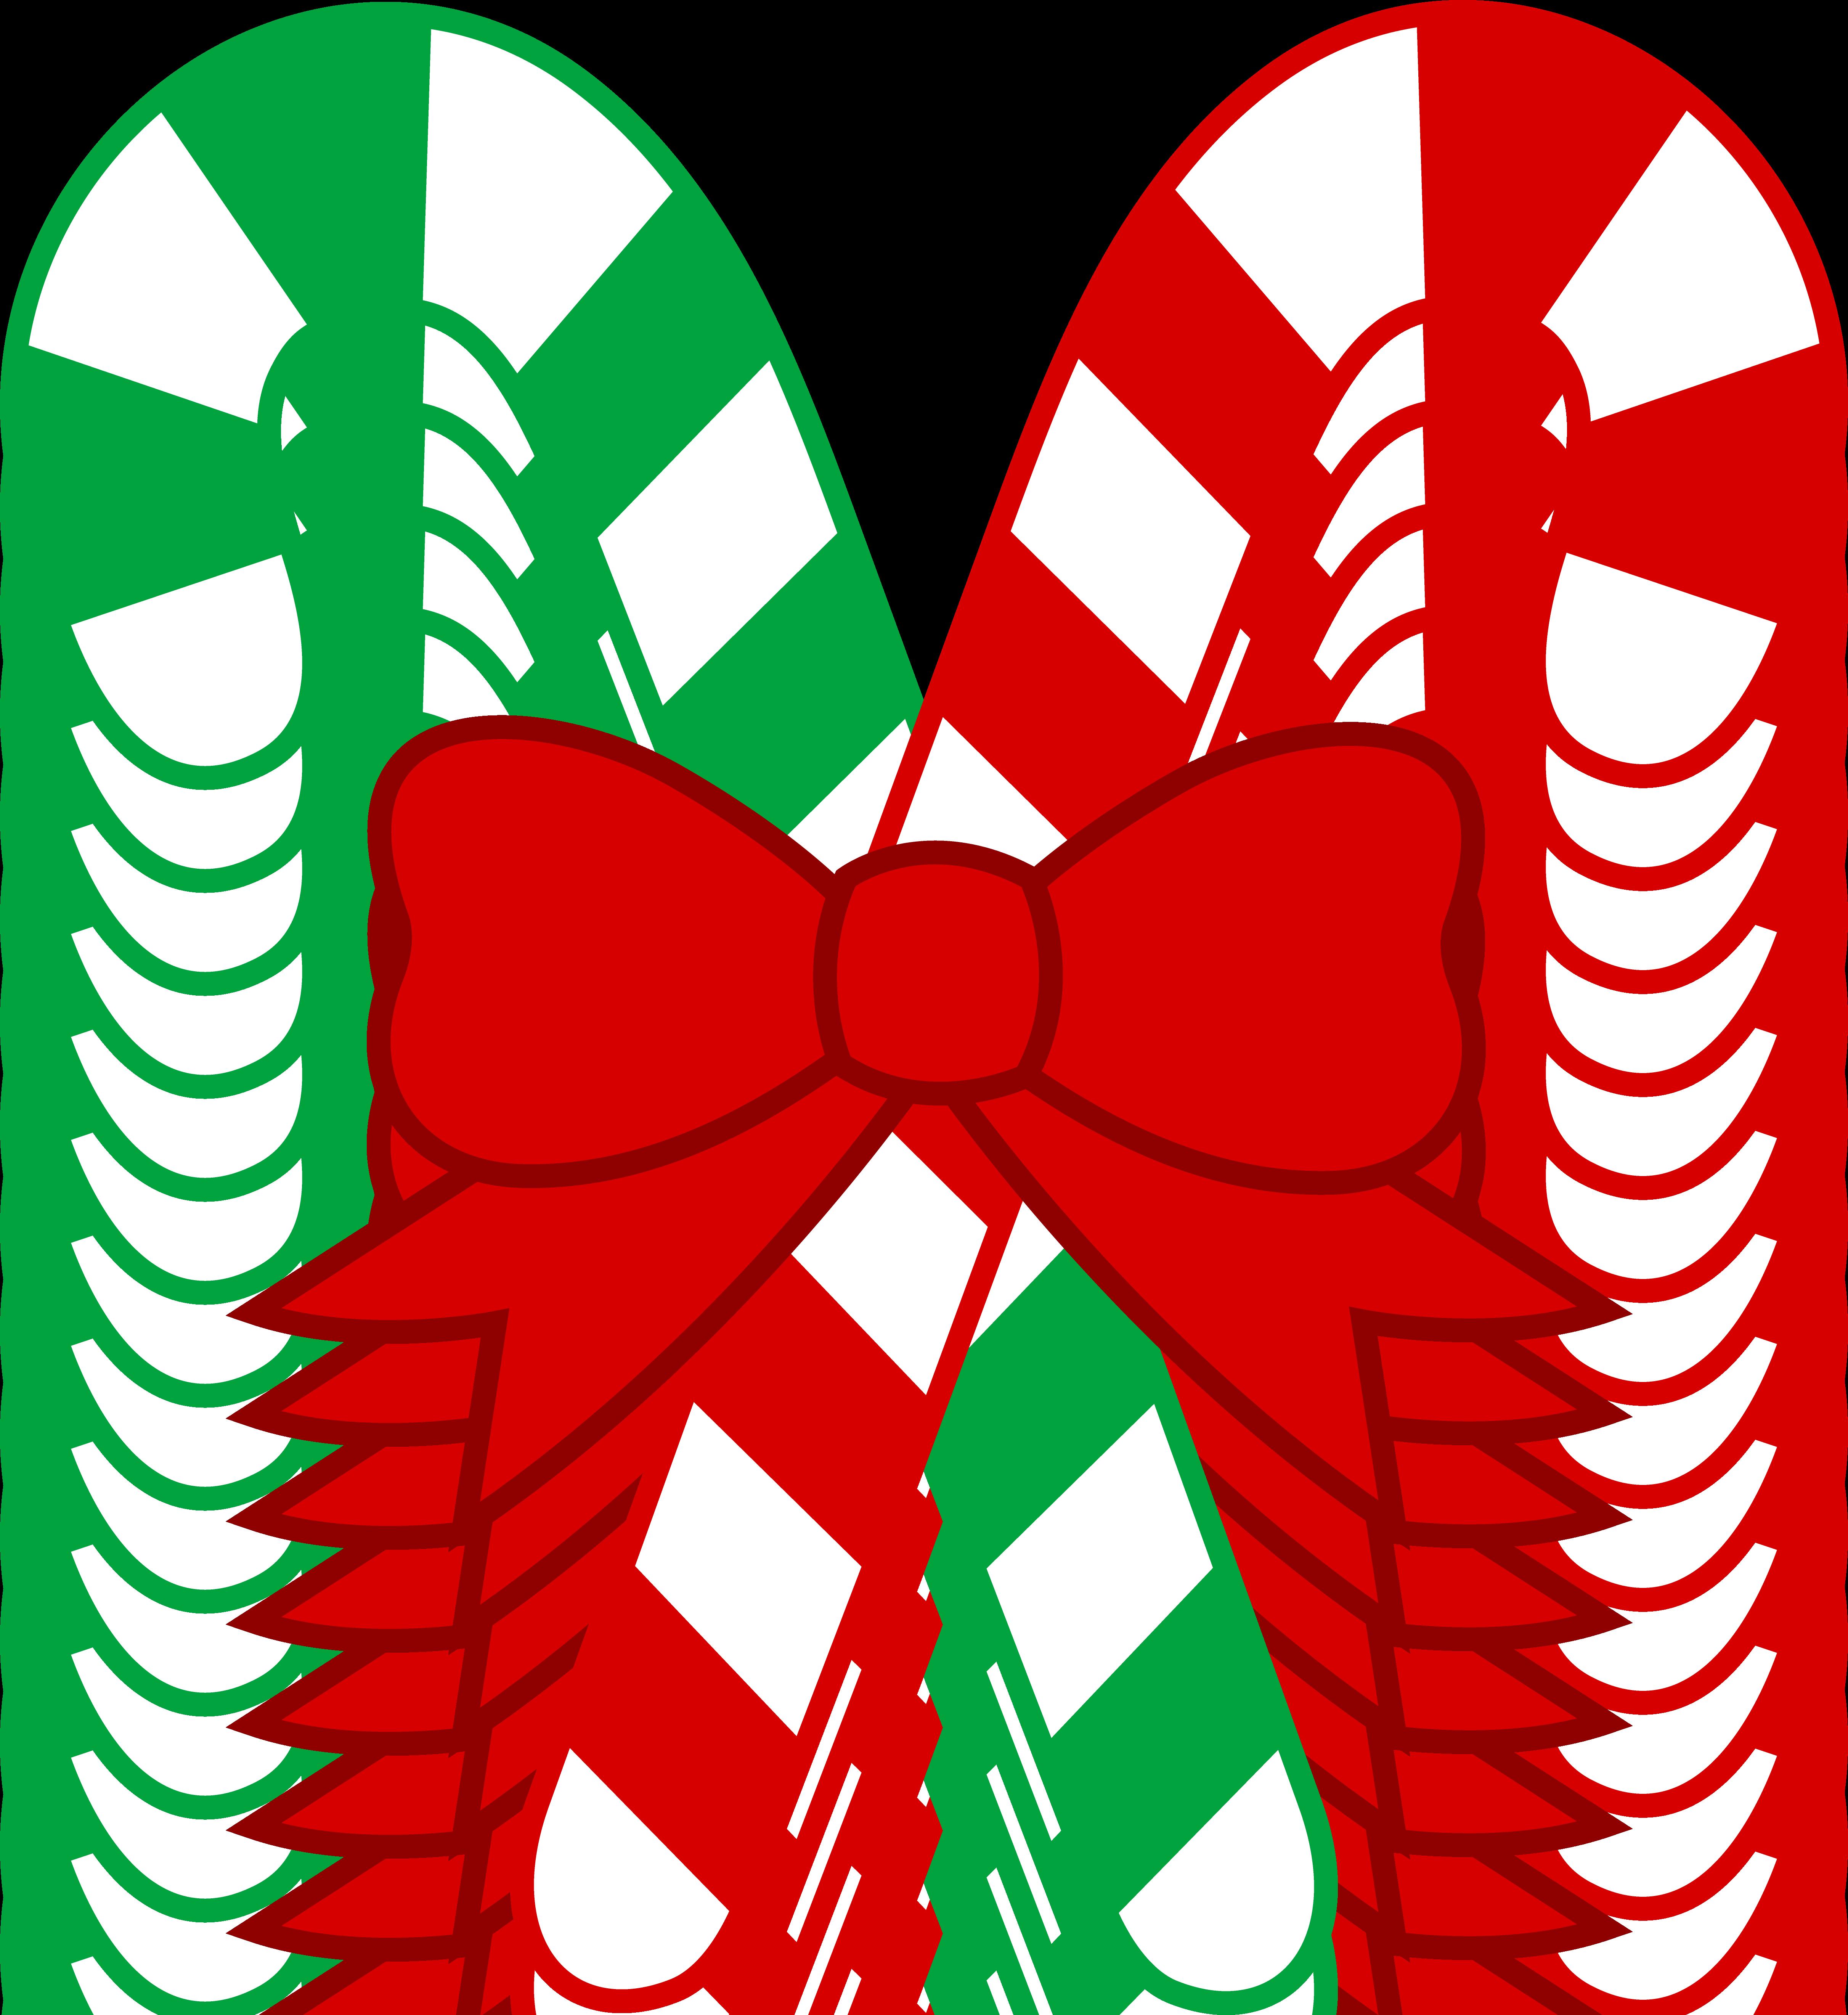 Merry Christmas Clip Art Christmas clipart free, Happy